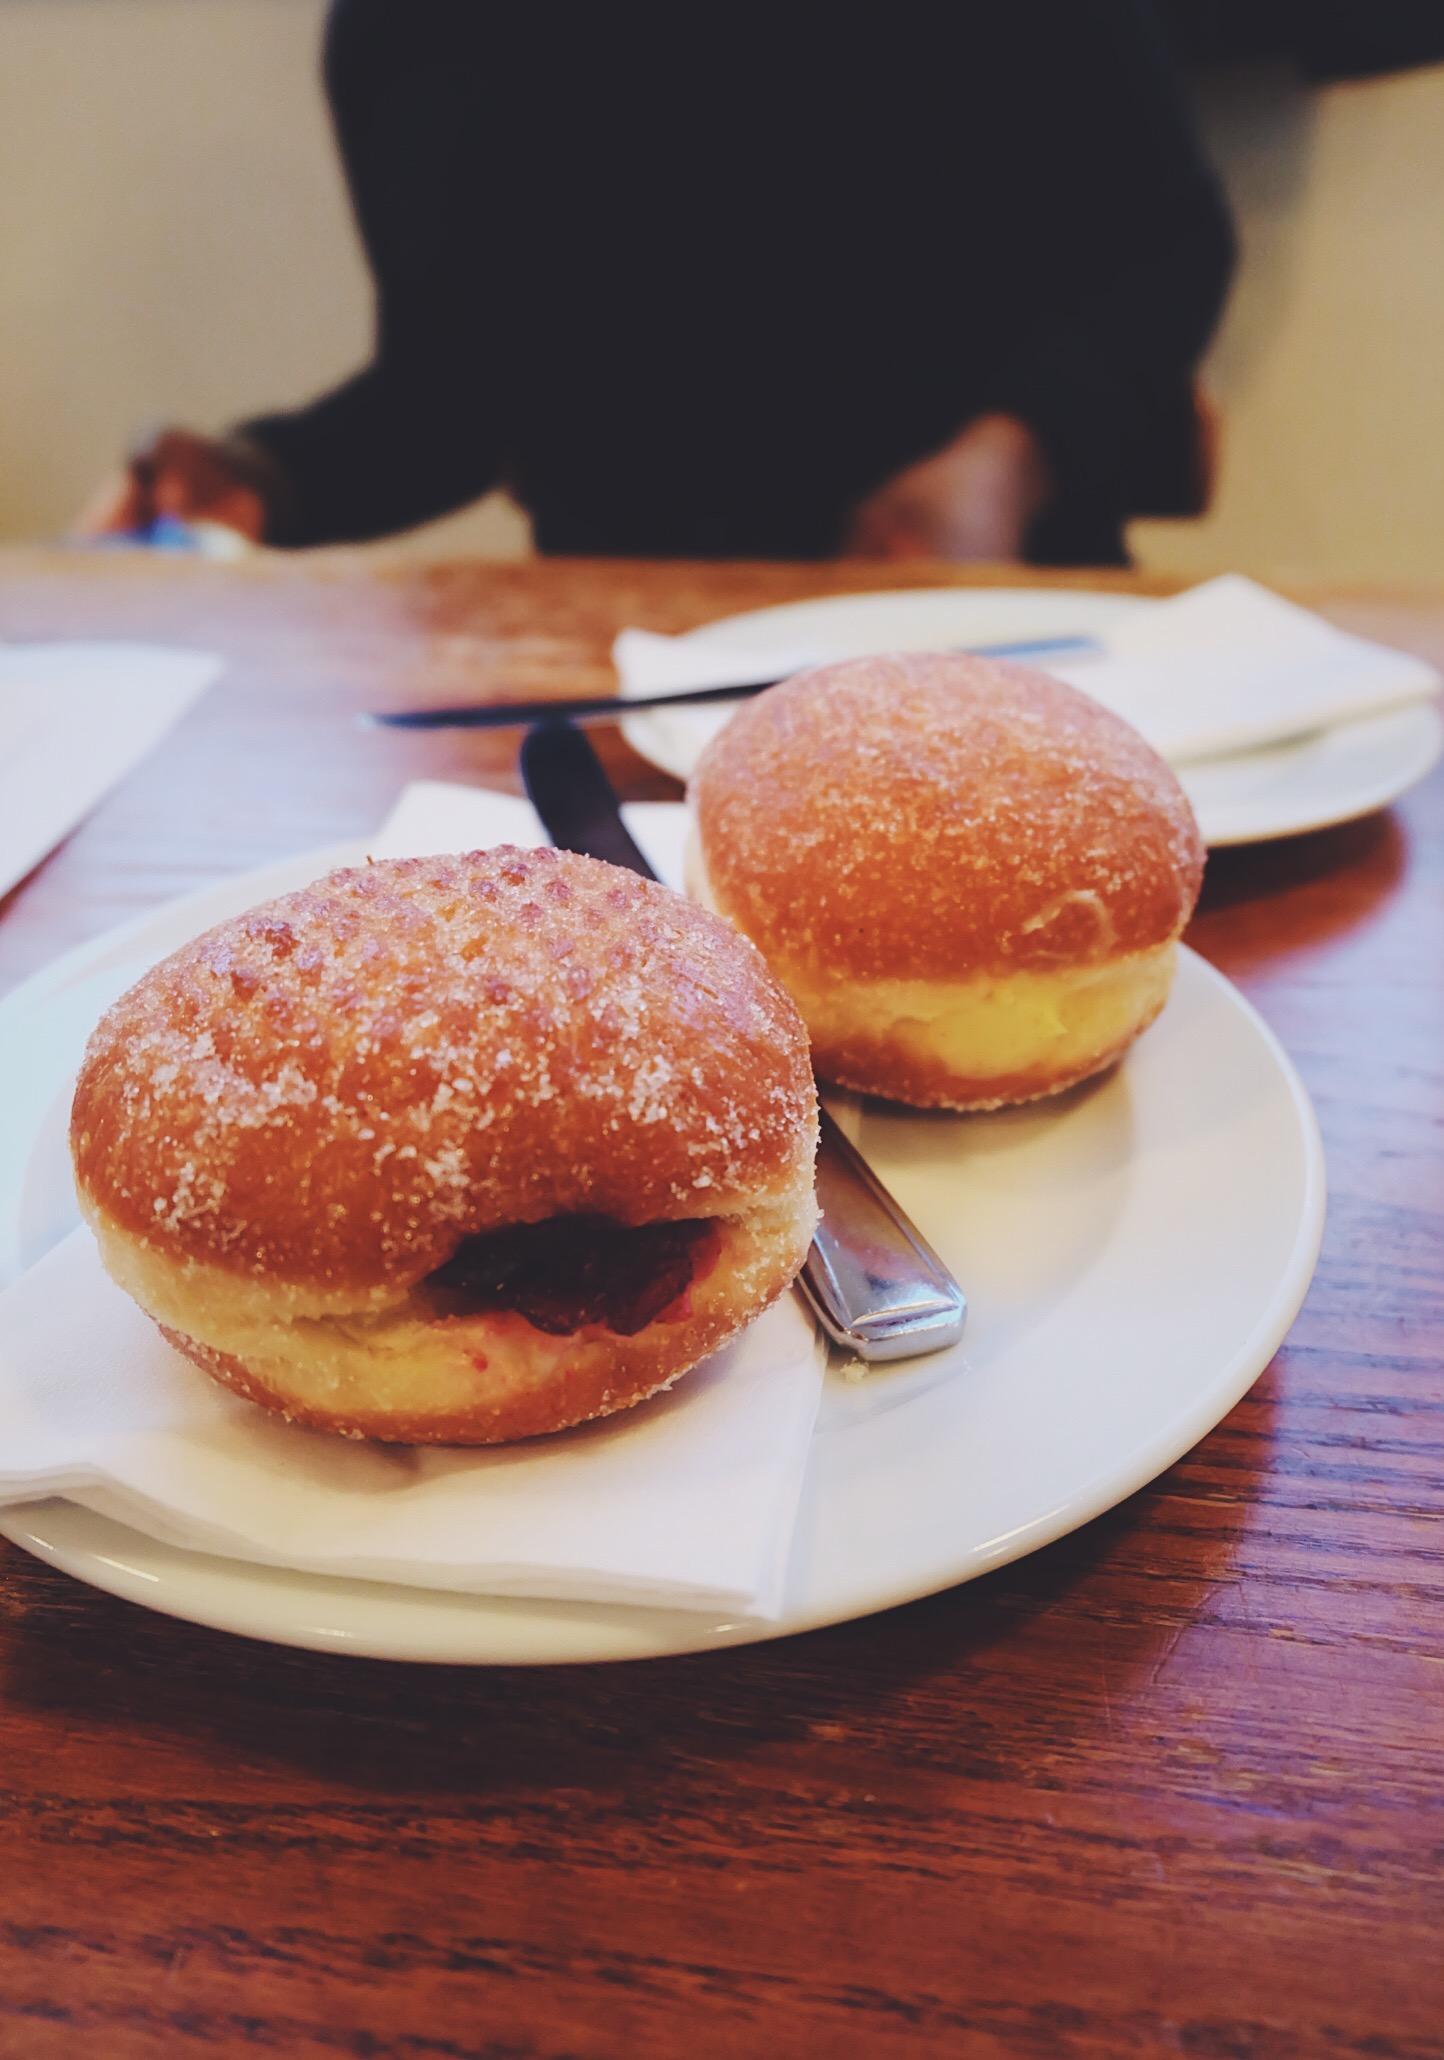 Doughnuts (lemon curd and raspberry jam)